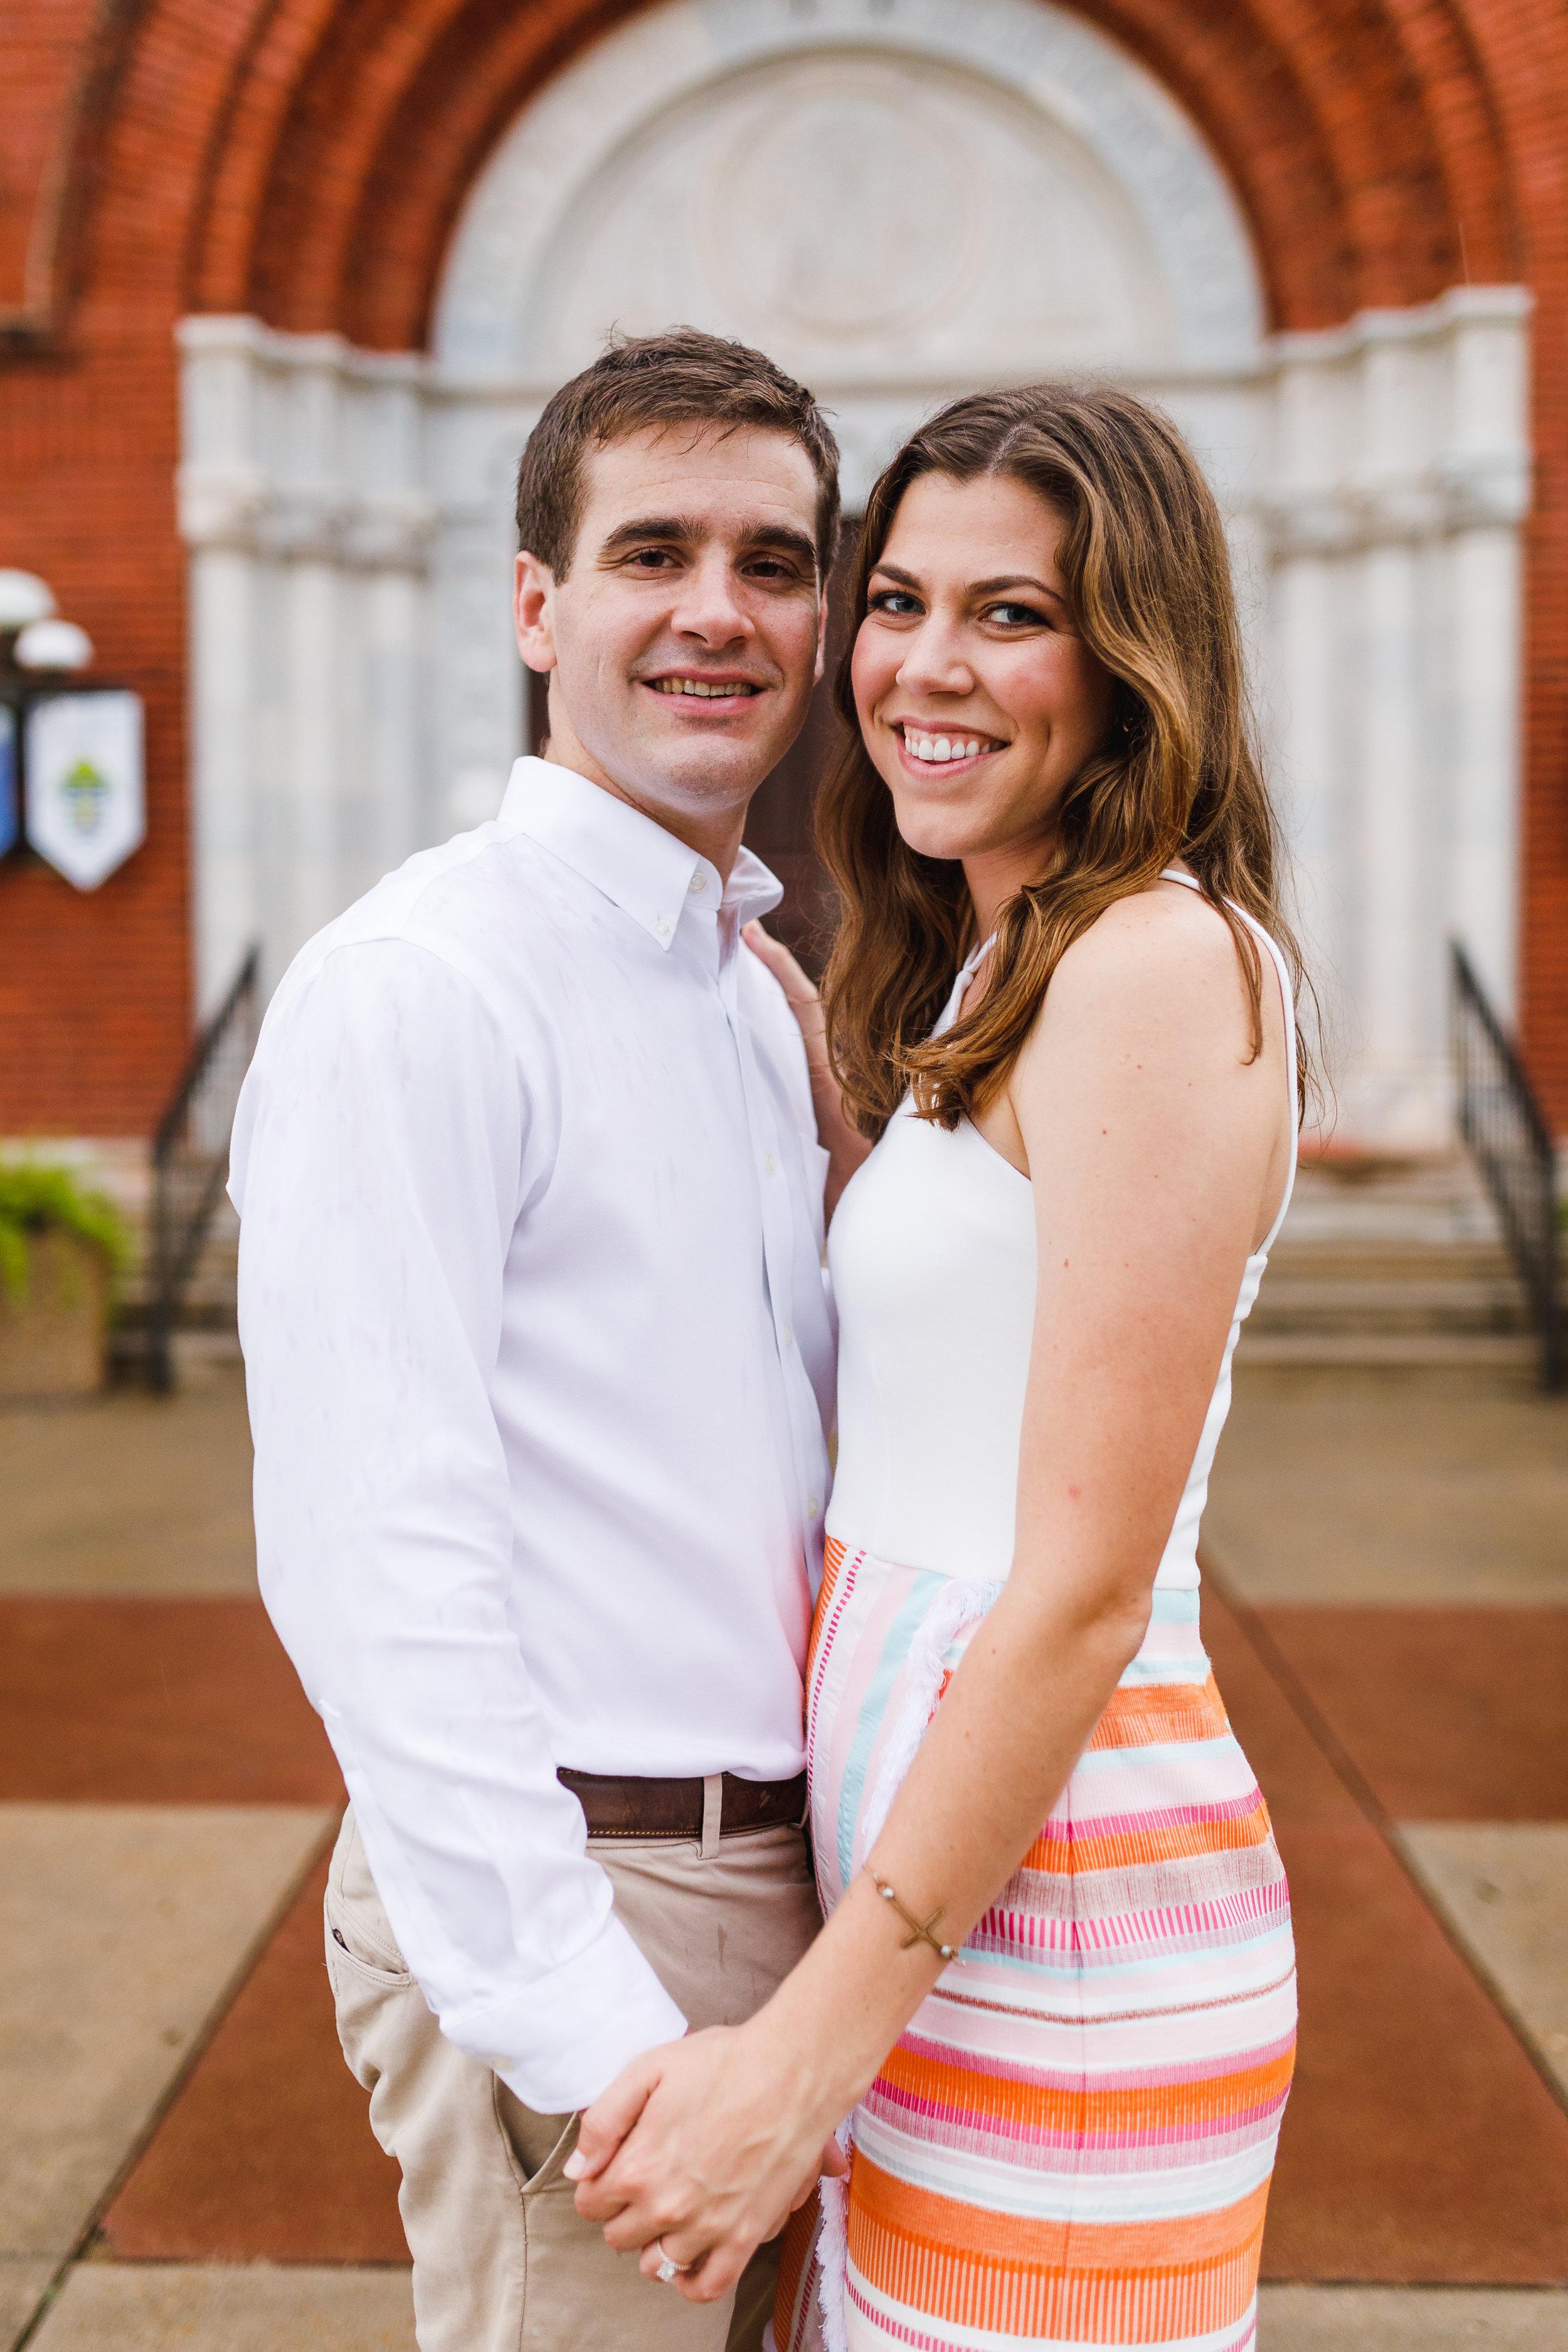 Youngsville-lafayette-portrait-family-wedding-photographer-7773.jpg